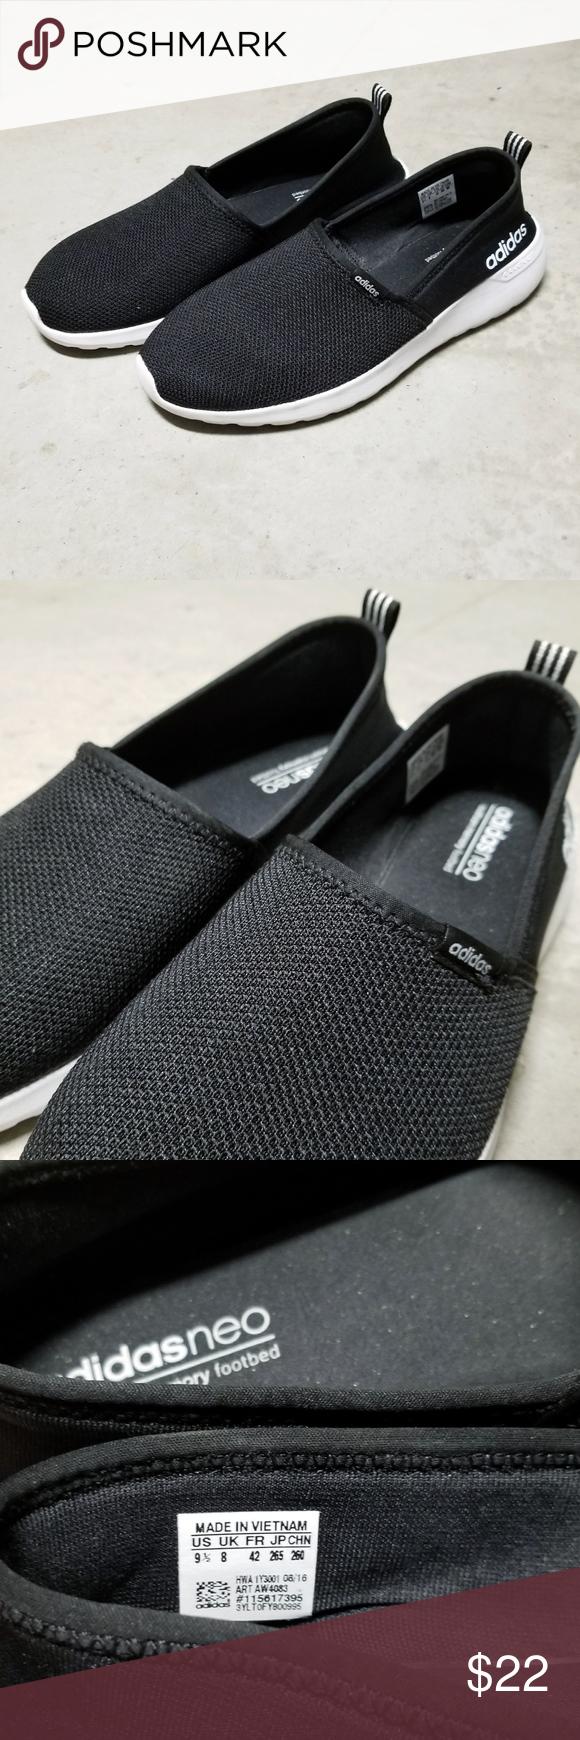 Adidas Neo Cloudfoam Lite Racer Slip Ons +A black pair of